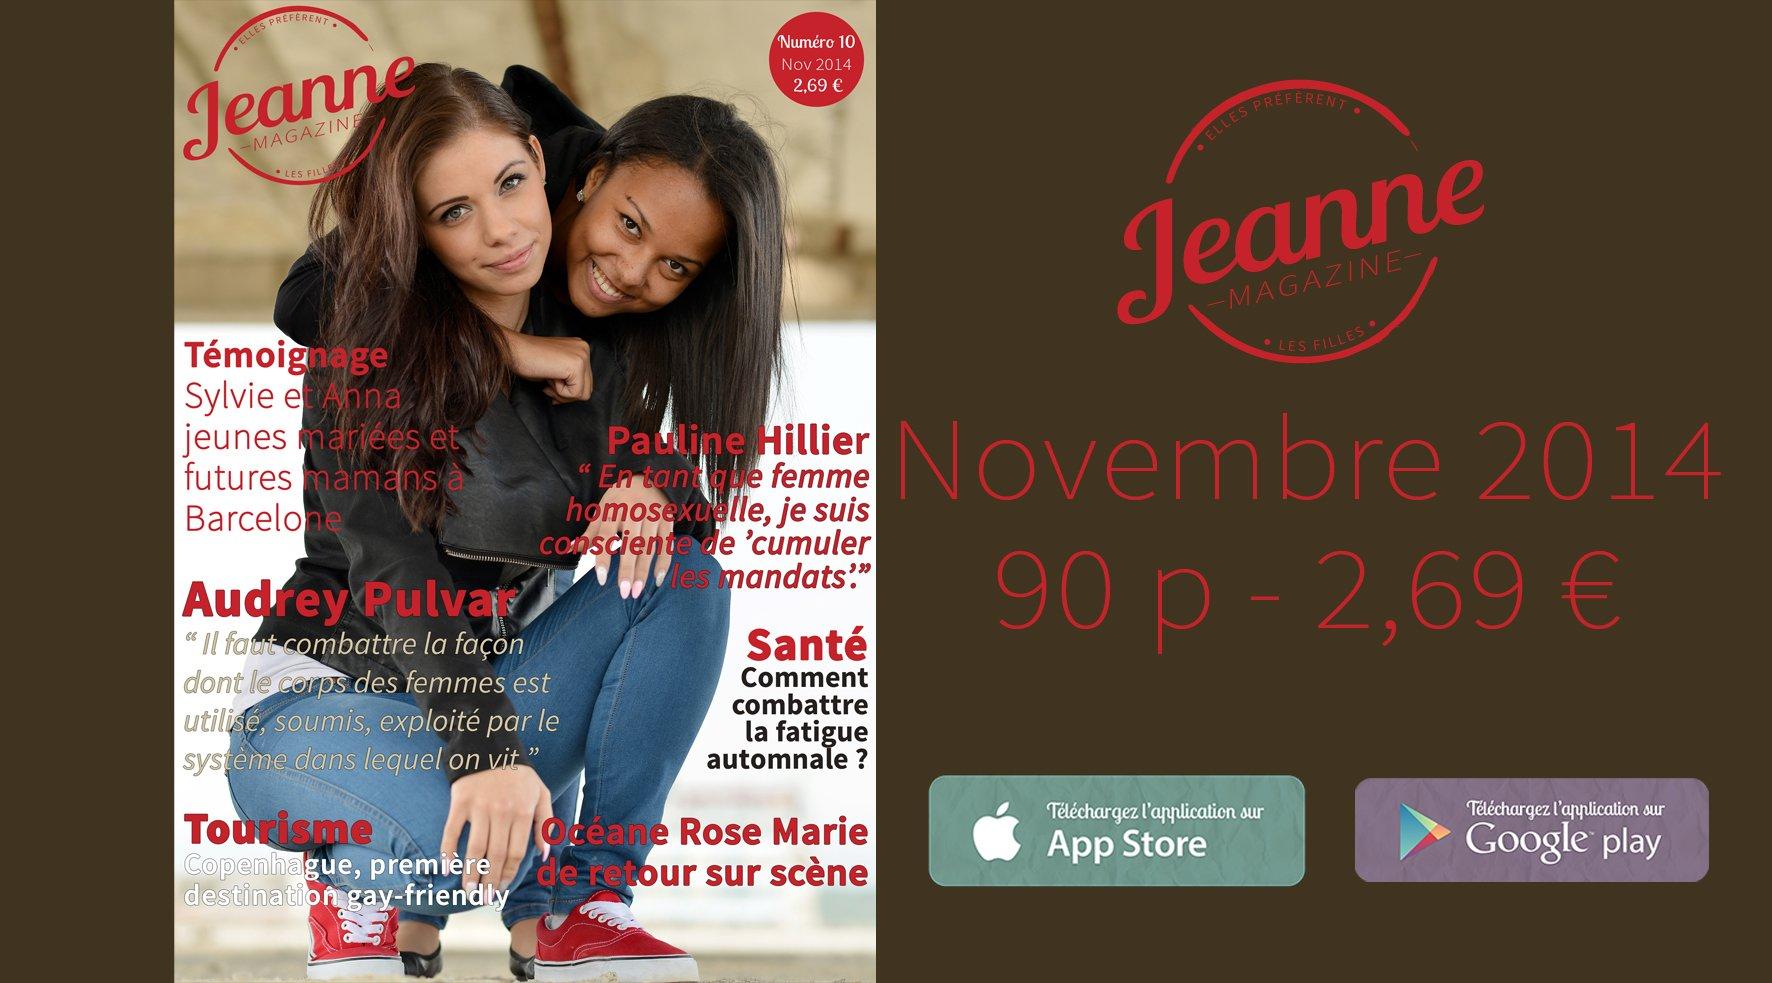 Sortie de Jeanne Magazine n°10 – novembre 2014